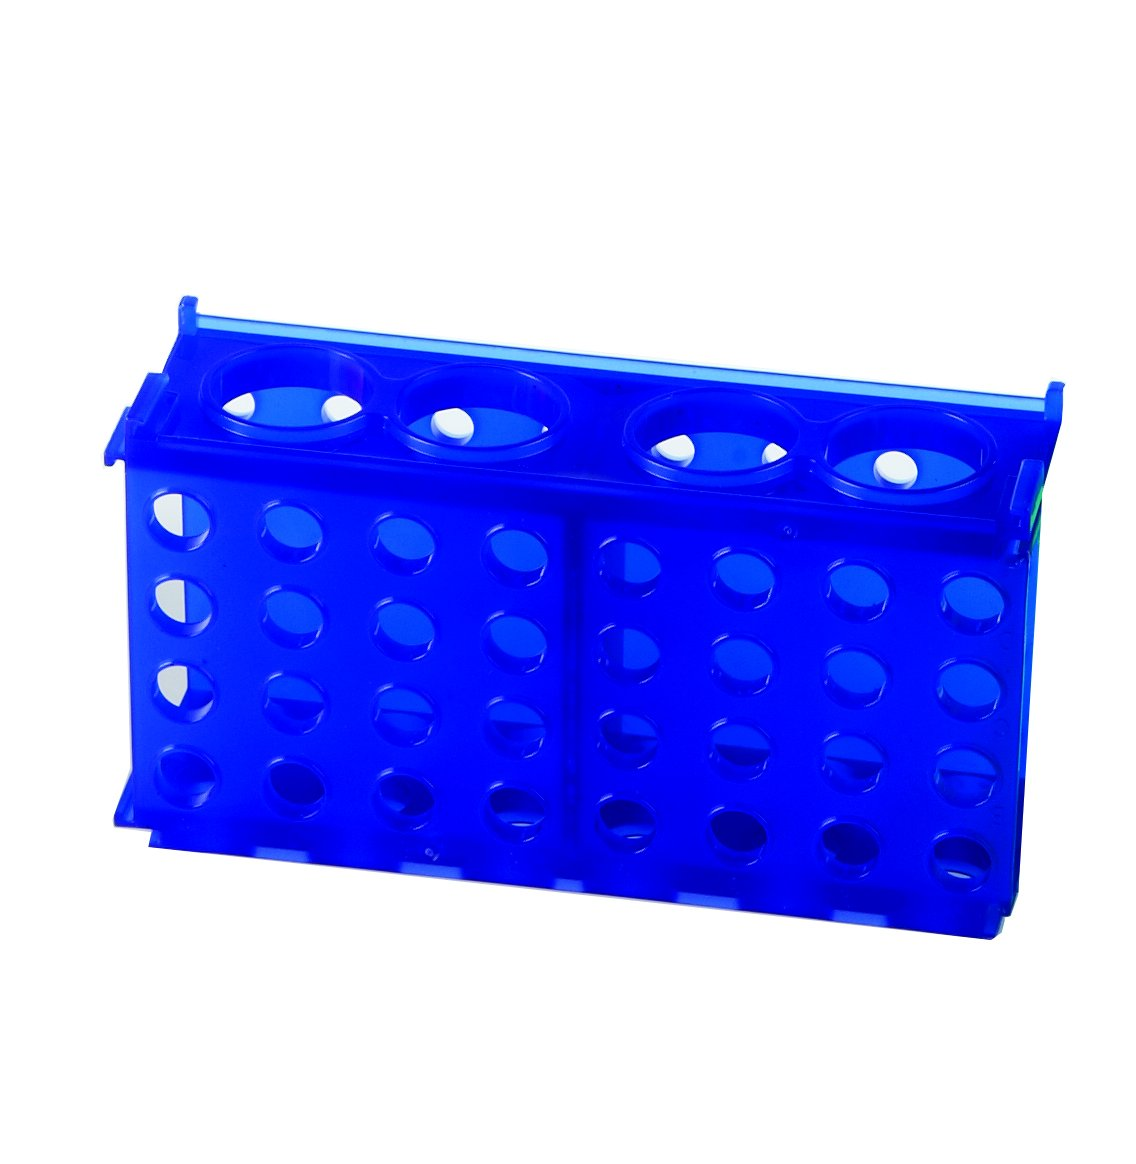 Heathrow Scientific HS29022B 4 Way Tube Rack, Polypropylene, Blue (Pack of 5) by Heathrow Scientific